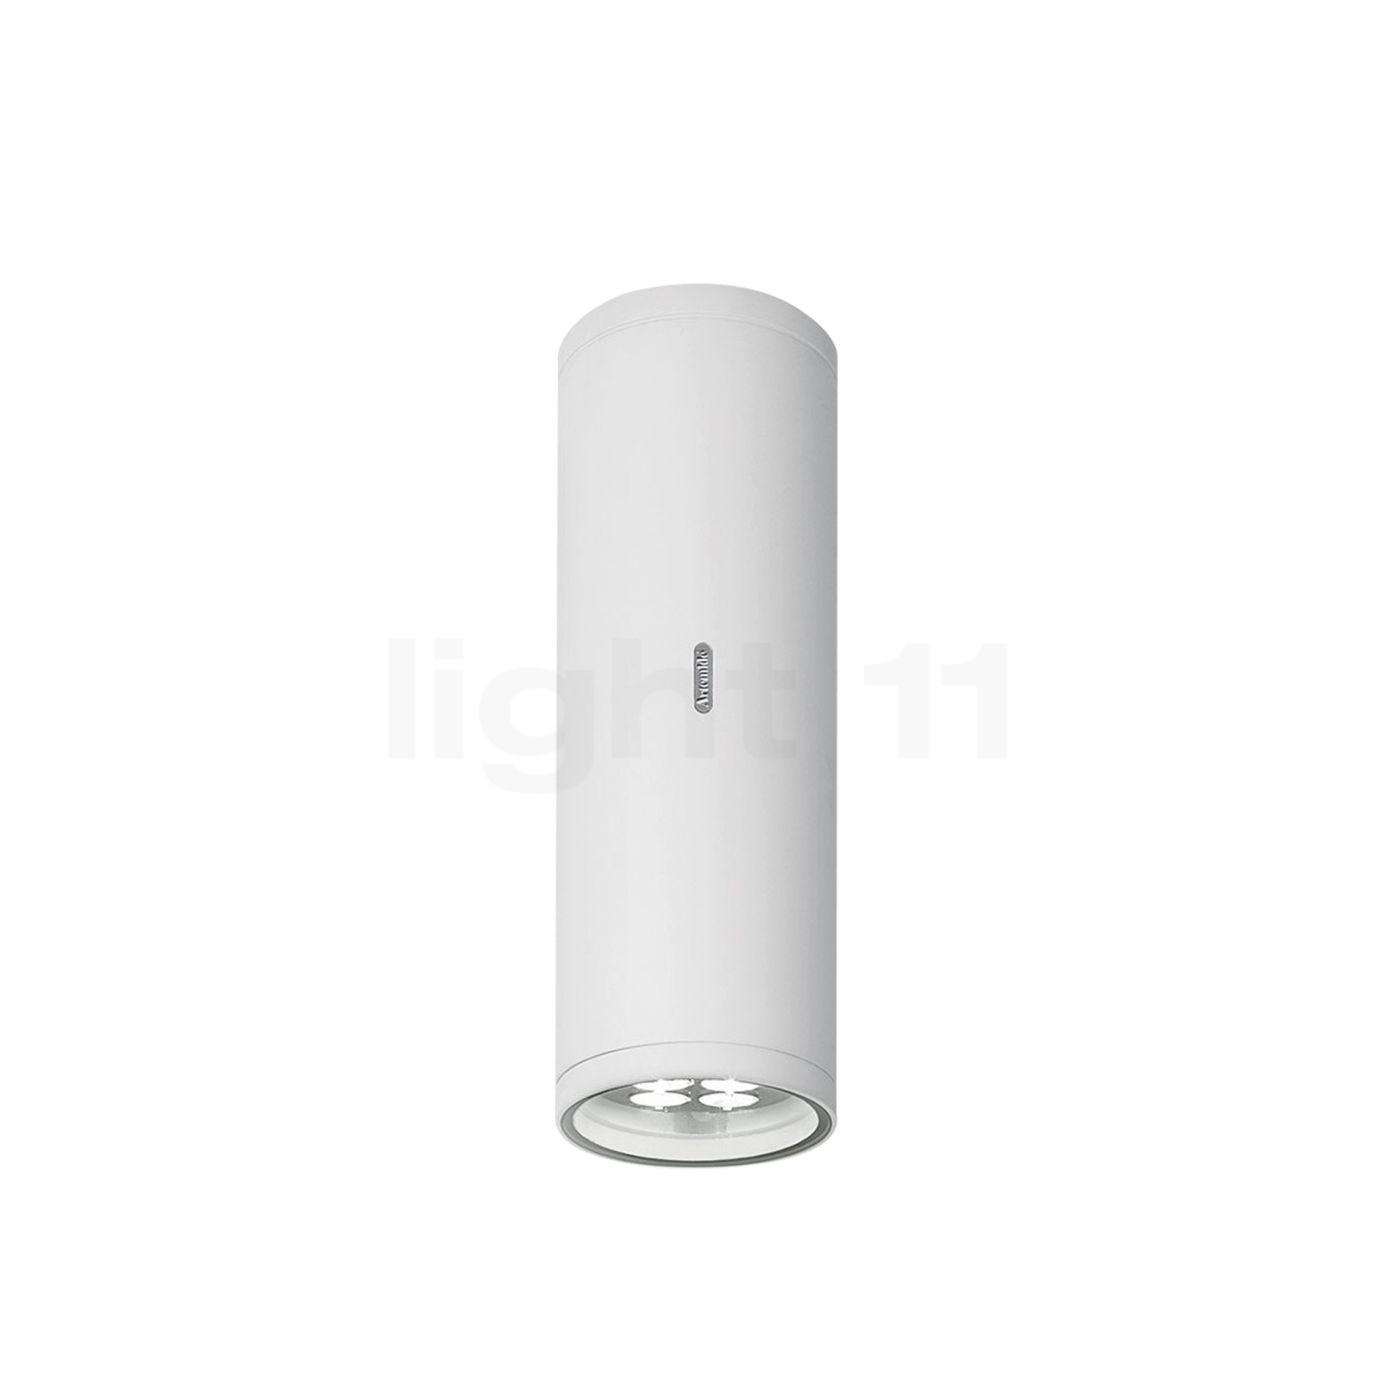 Artemide Calumet Wandleuchte LED, weiß, 35 cm T41941NW00